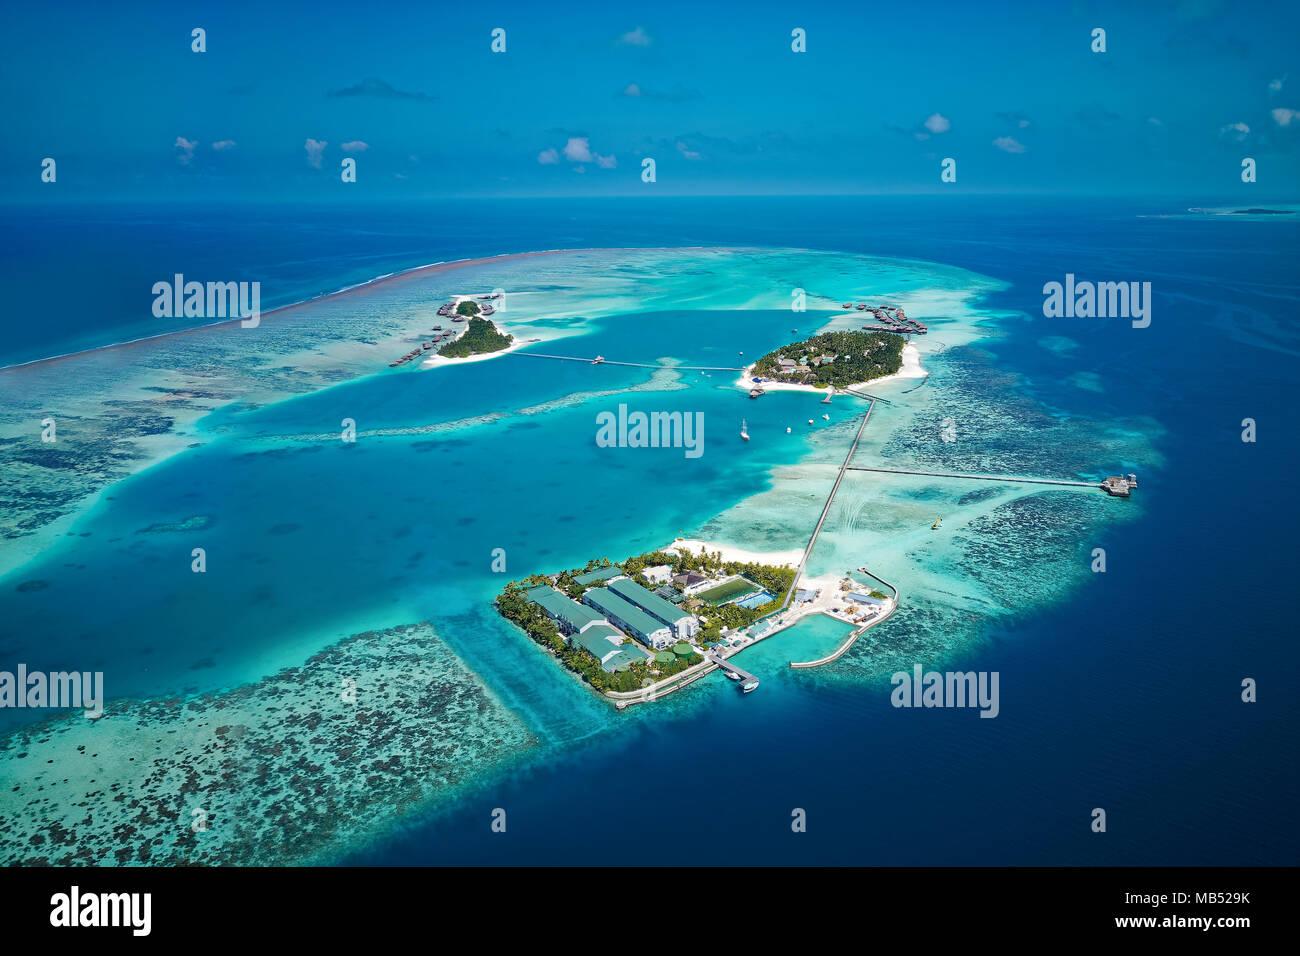 Conrad Maldives Rangali Island, luxury resort, coral reef, Rangalifinolhu, Ari Atoll, Indian Ocean, Maldives - Stock Image